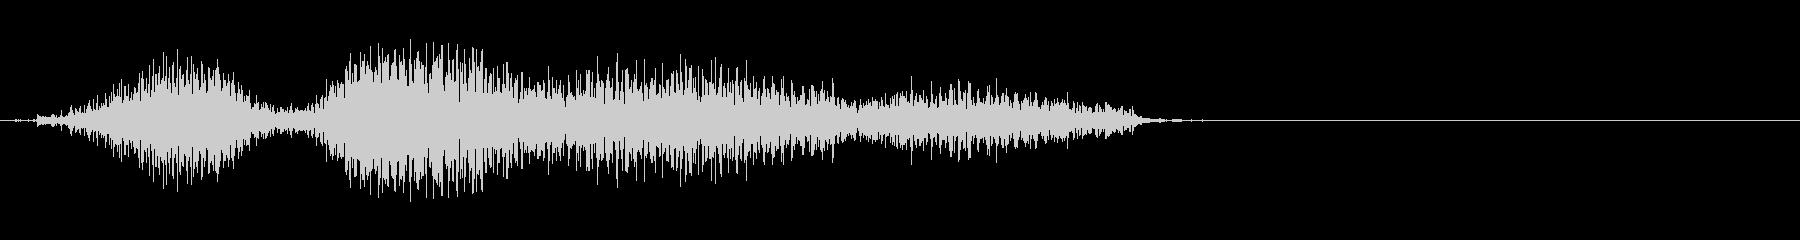 STEEL GUITAR:CHOR...の未再生の波形